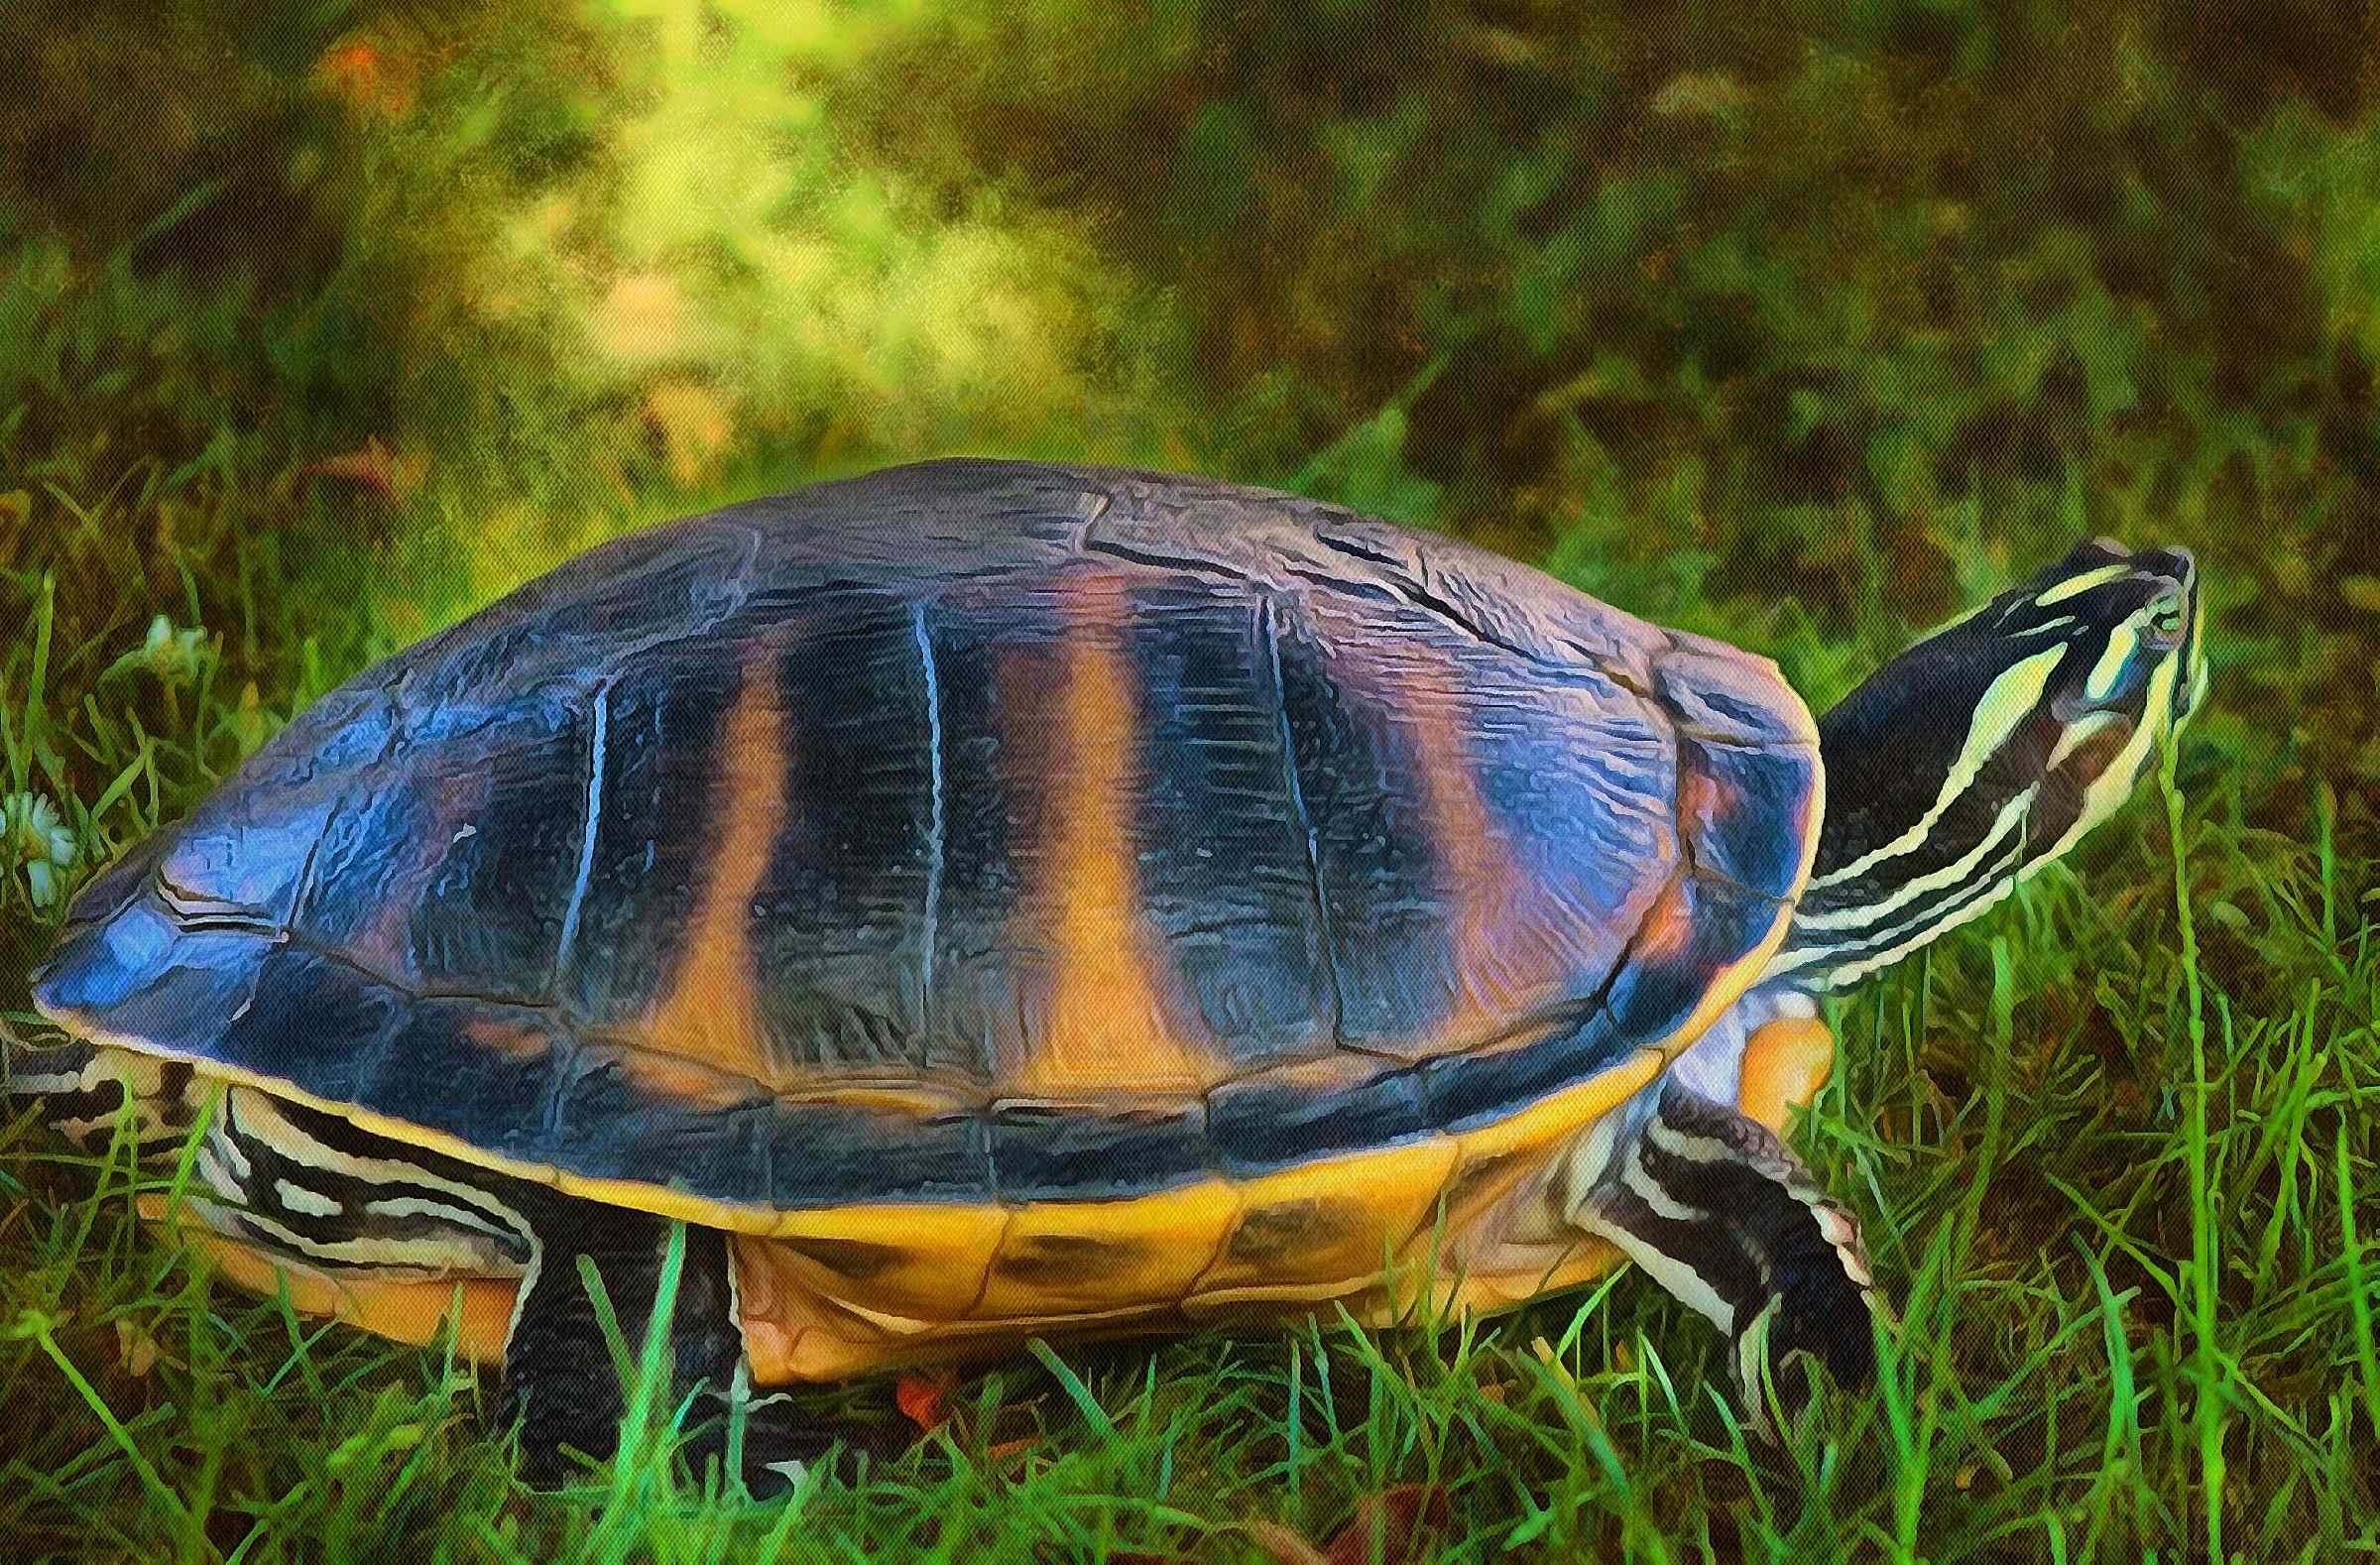 Turtle free images, Free Tortoise images, – free images turtles, tortoise public domain images, Turtle public domain images, Tortoise free!